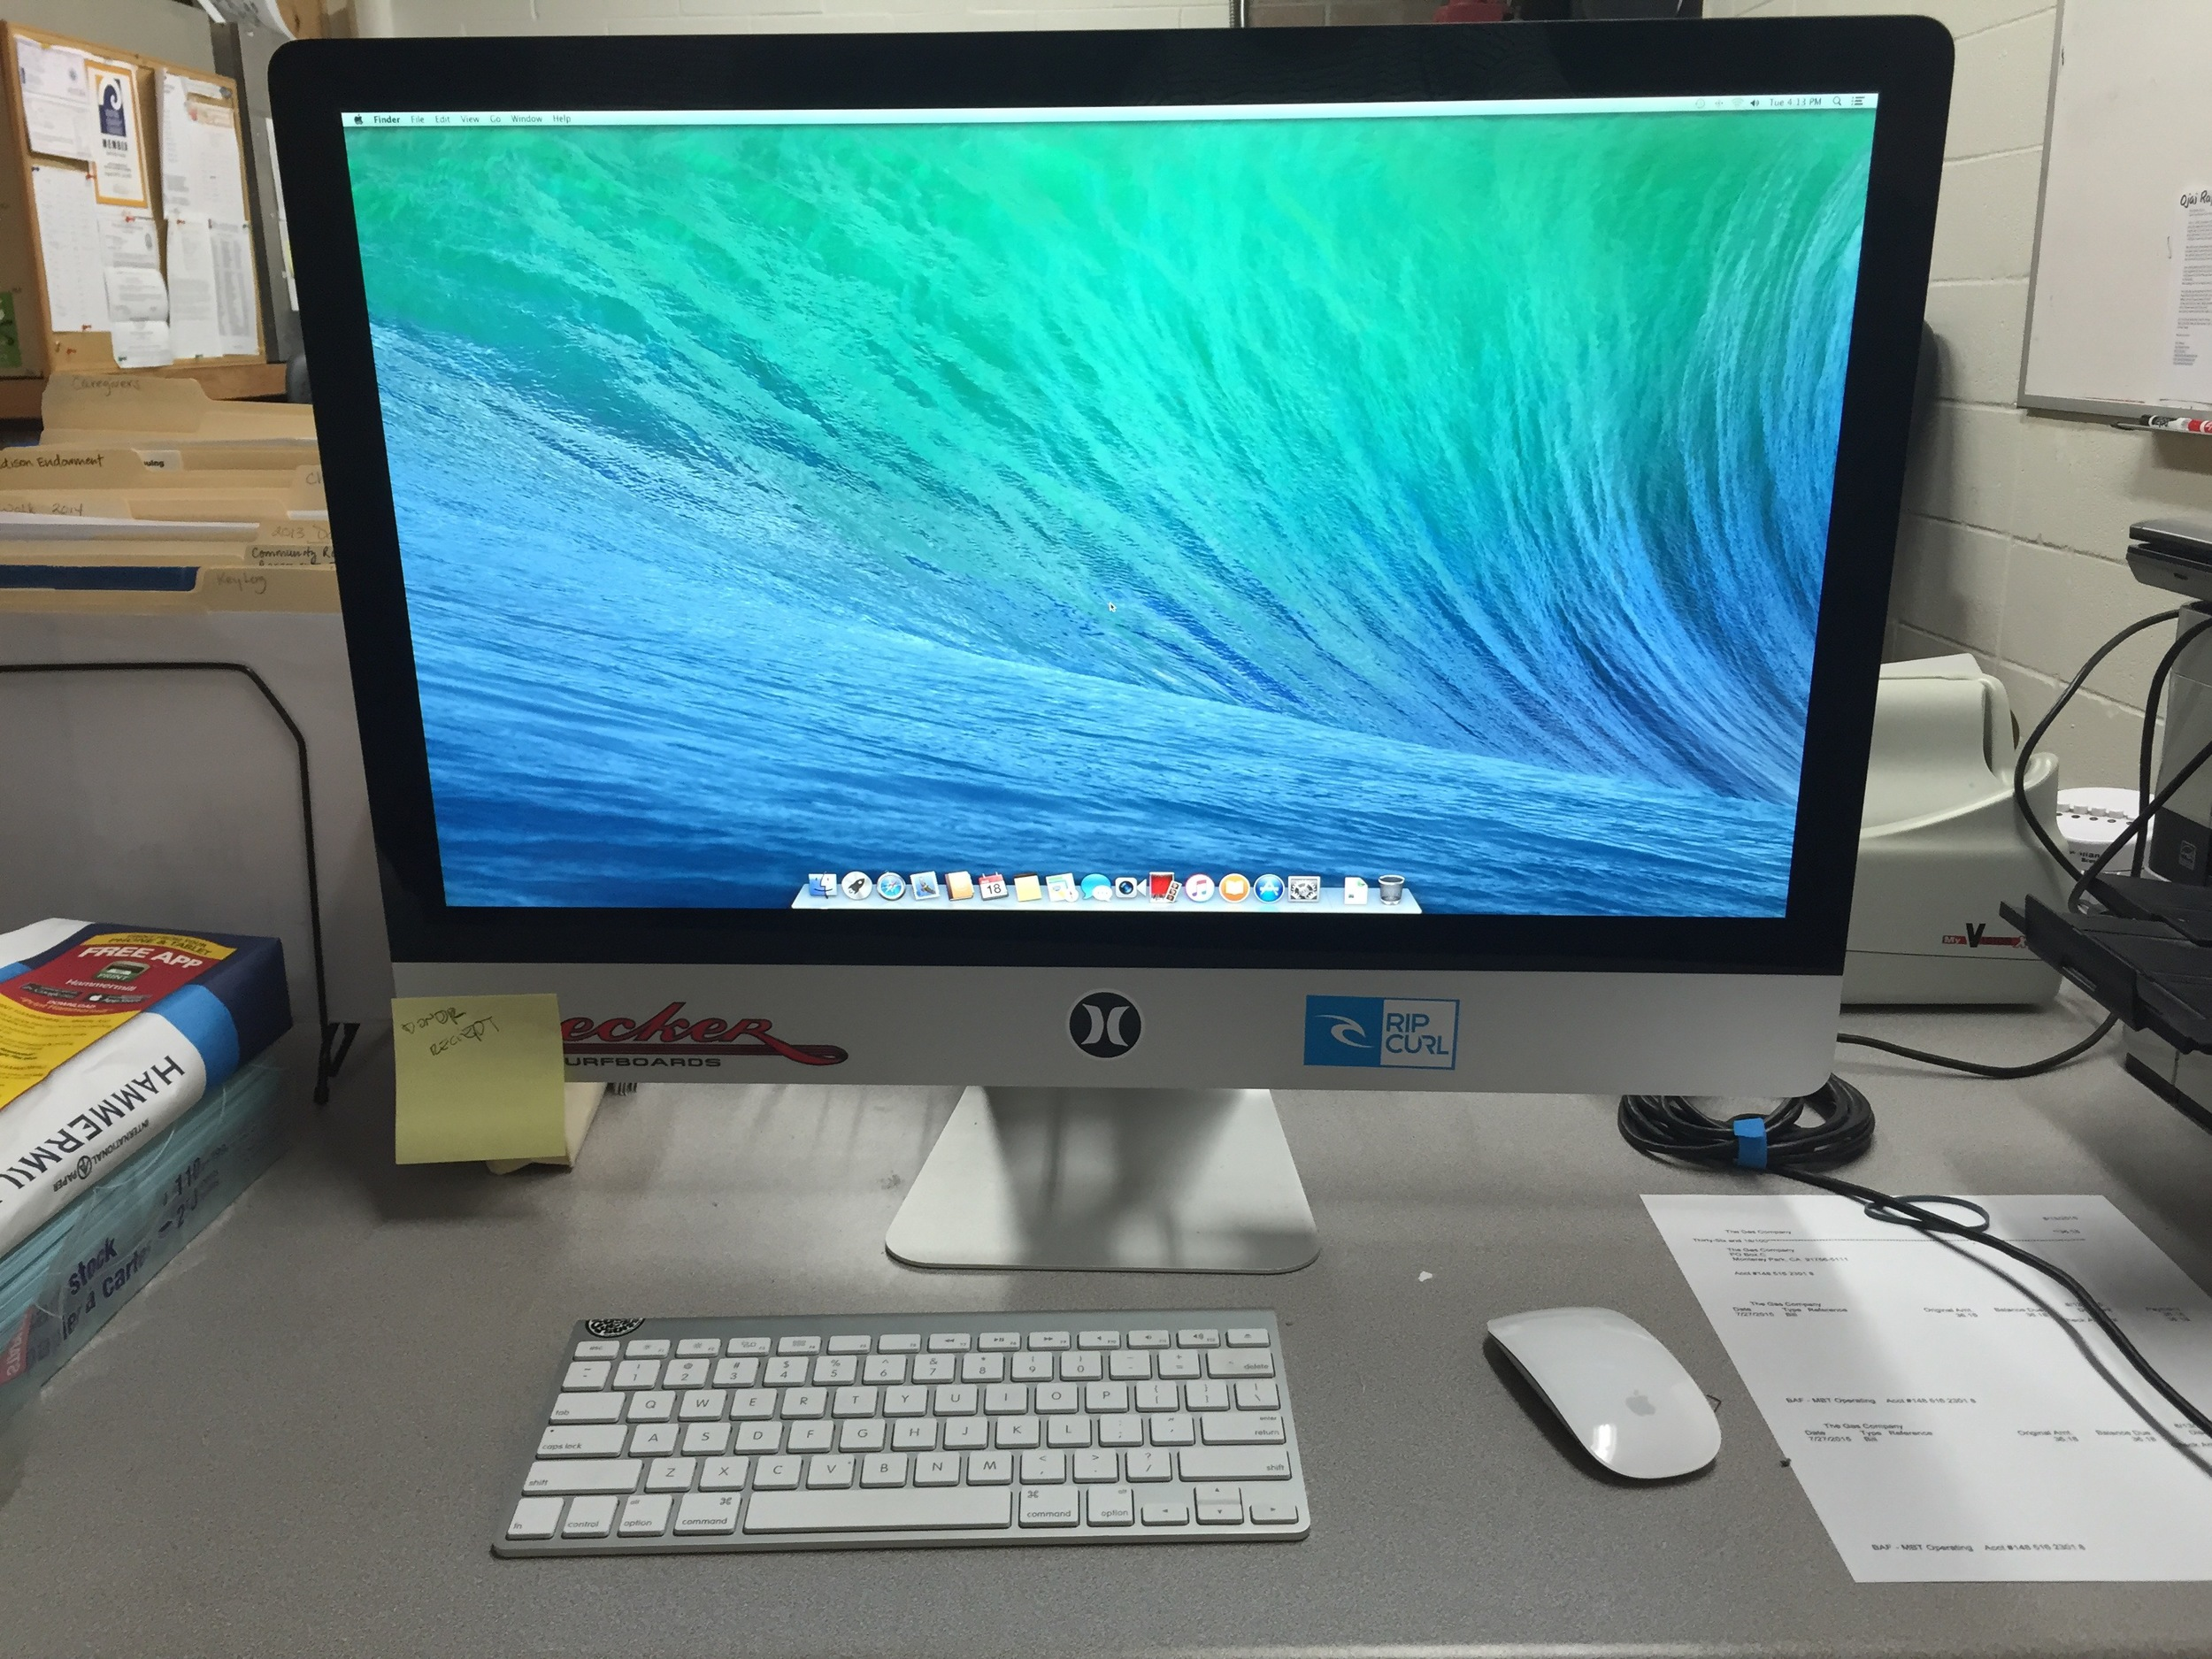 A donated iMac